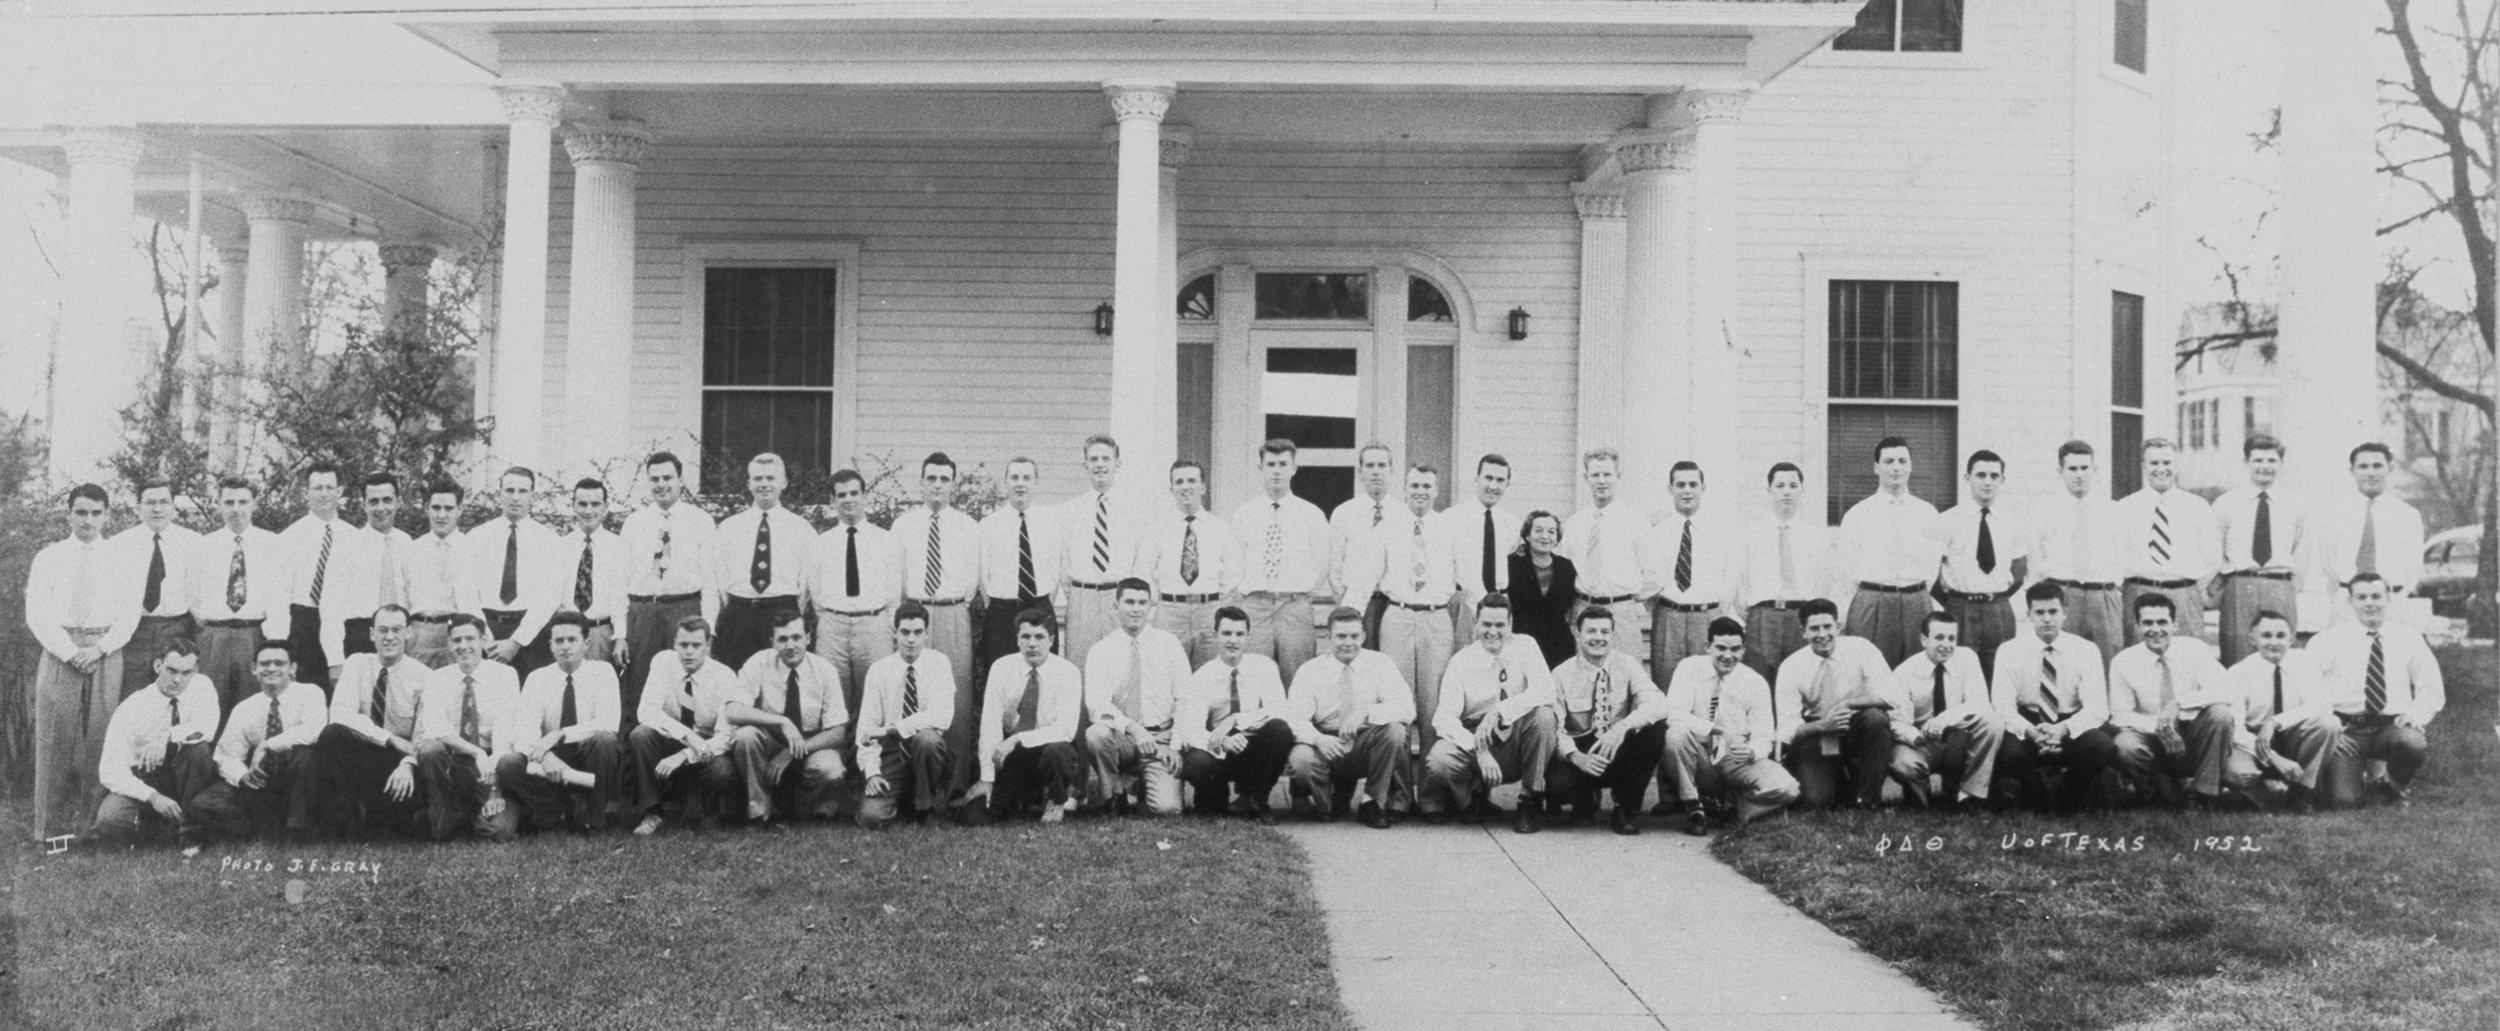 Phi Delta Theta at The University of Texas at Austin (1952)